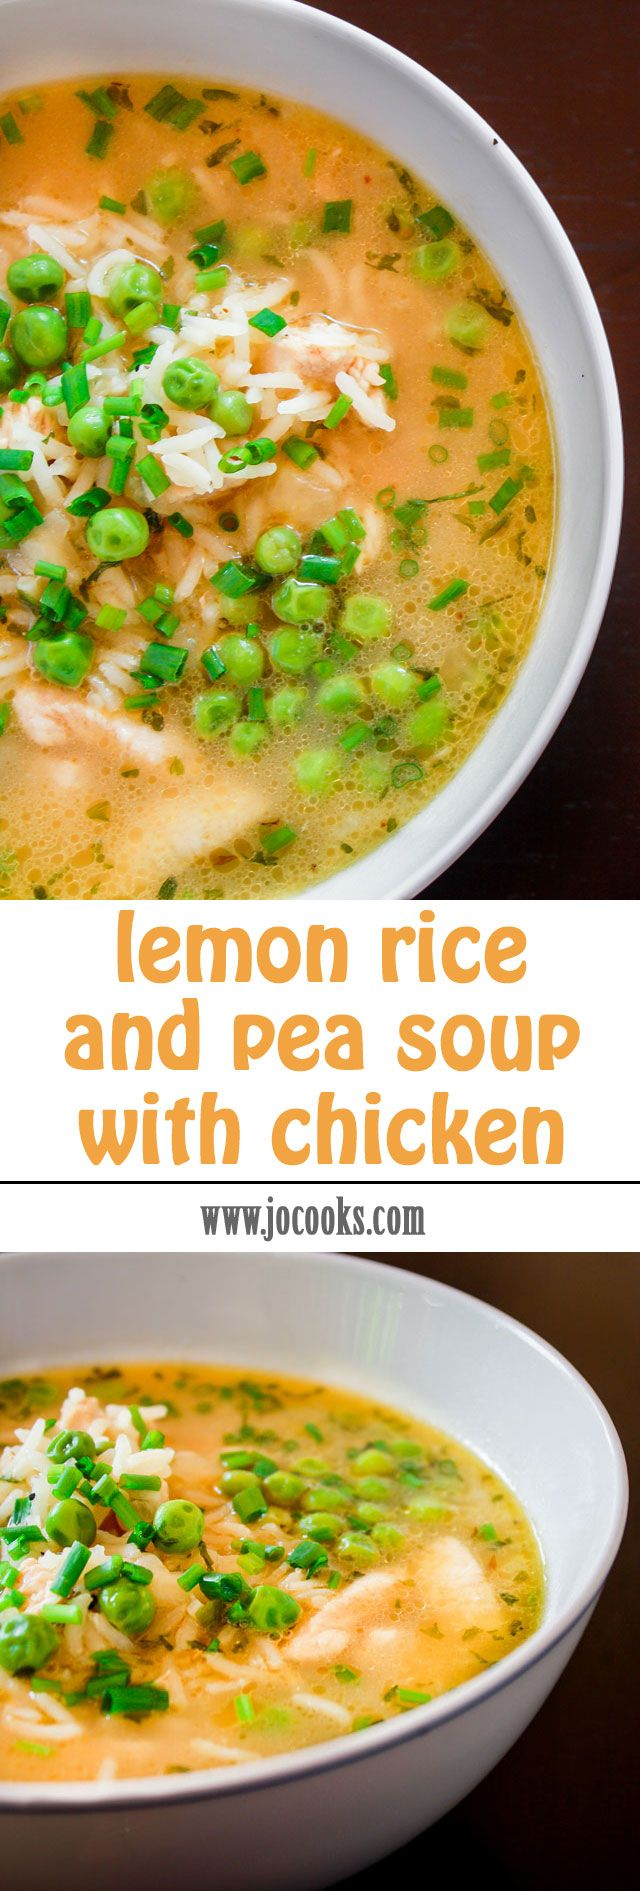 17 Best images about Soups on Pinterest | Cauliflower ...